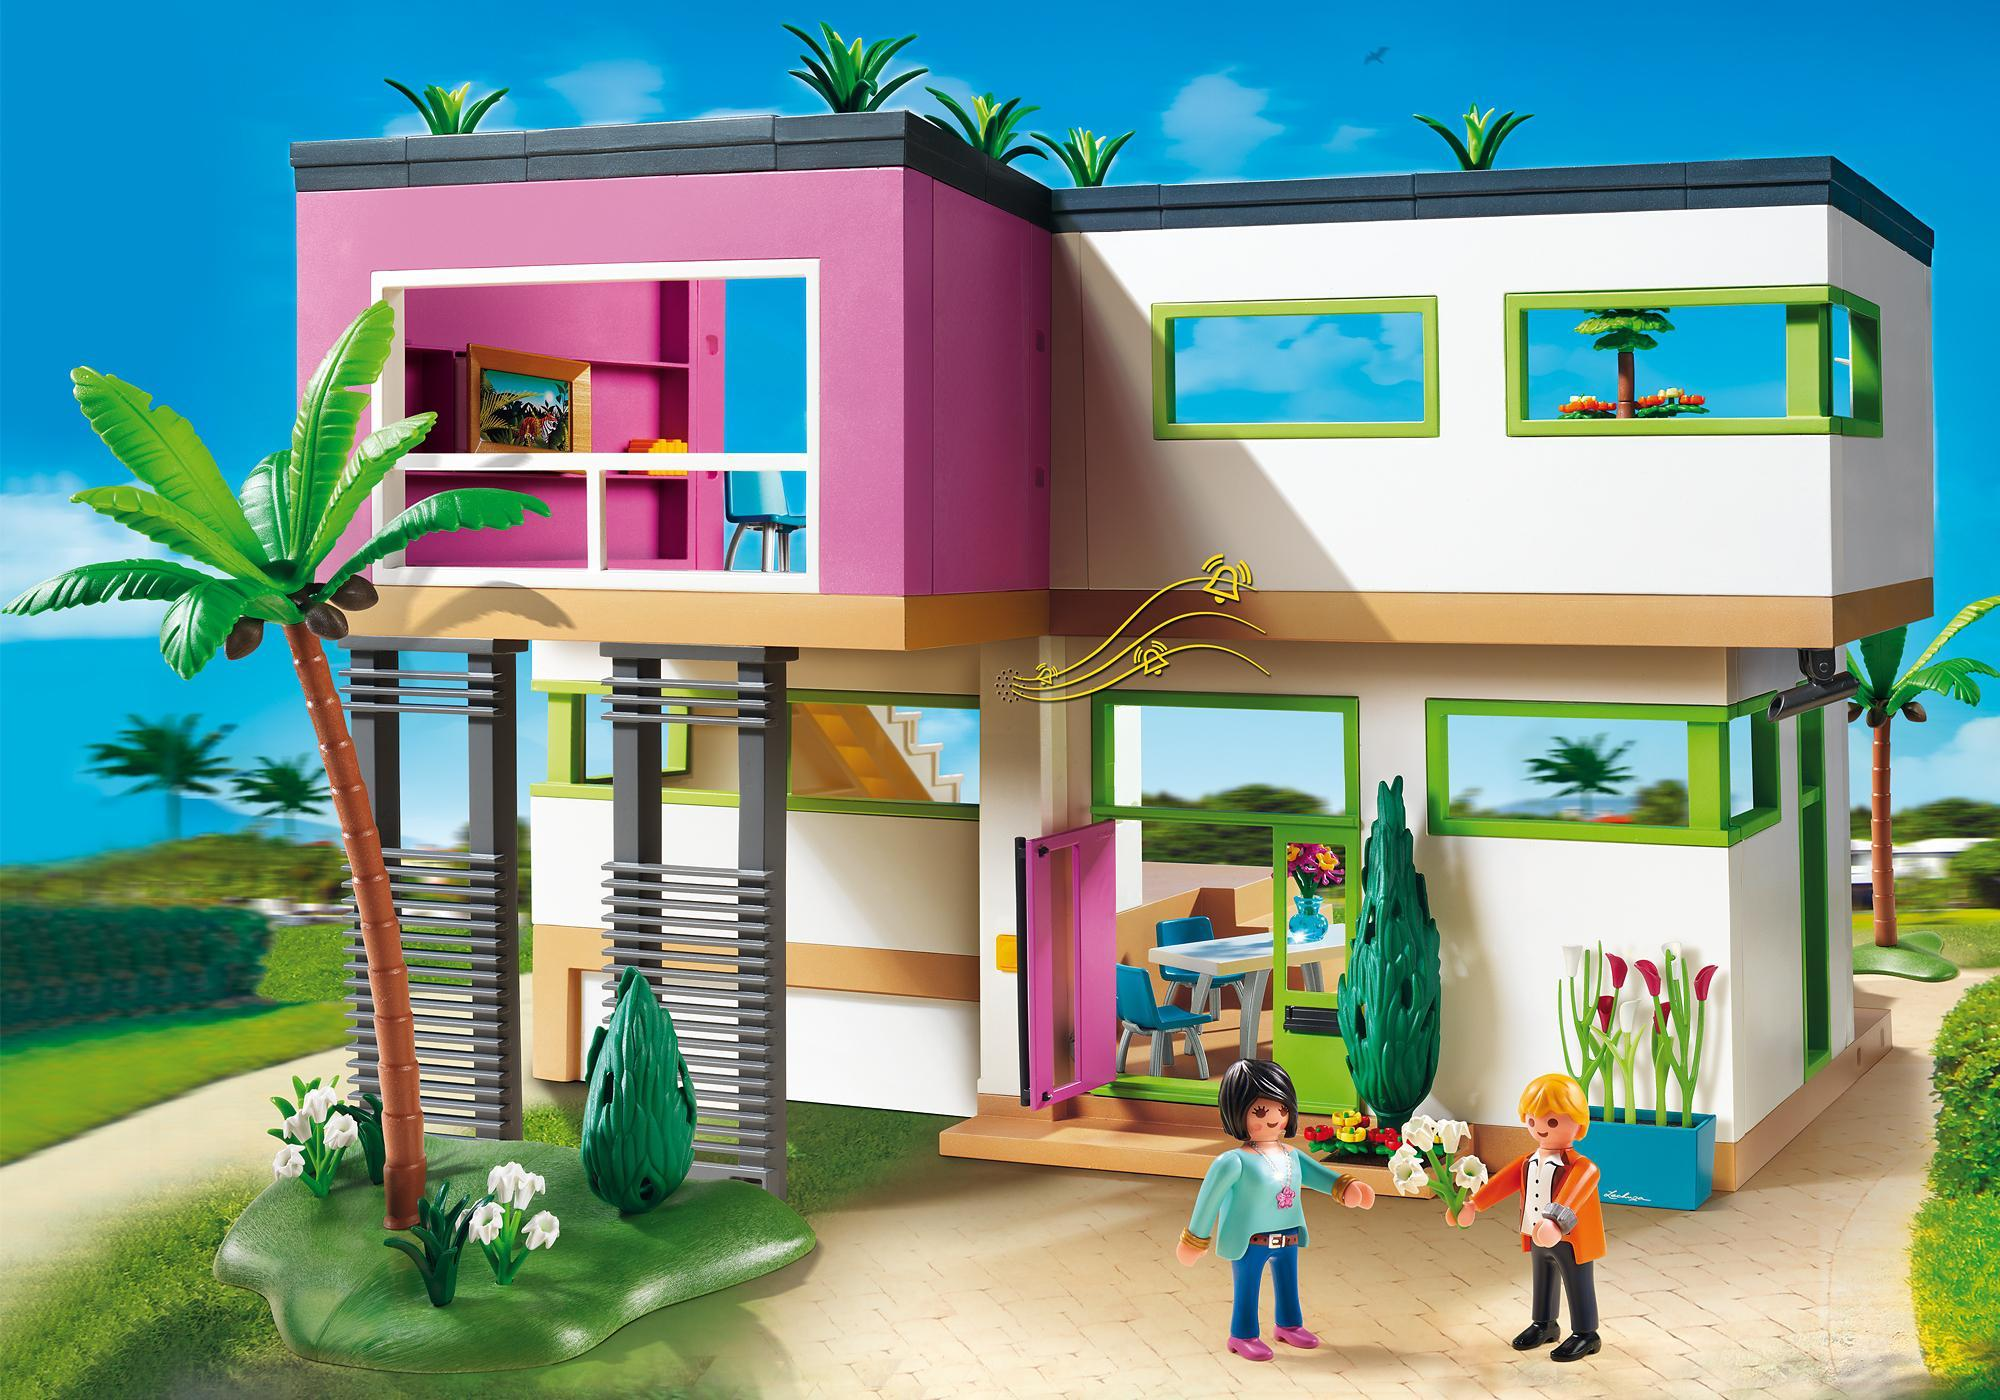 Great Maison Moderne De Playmobil With Image Maison Moderne